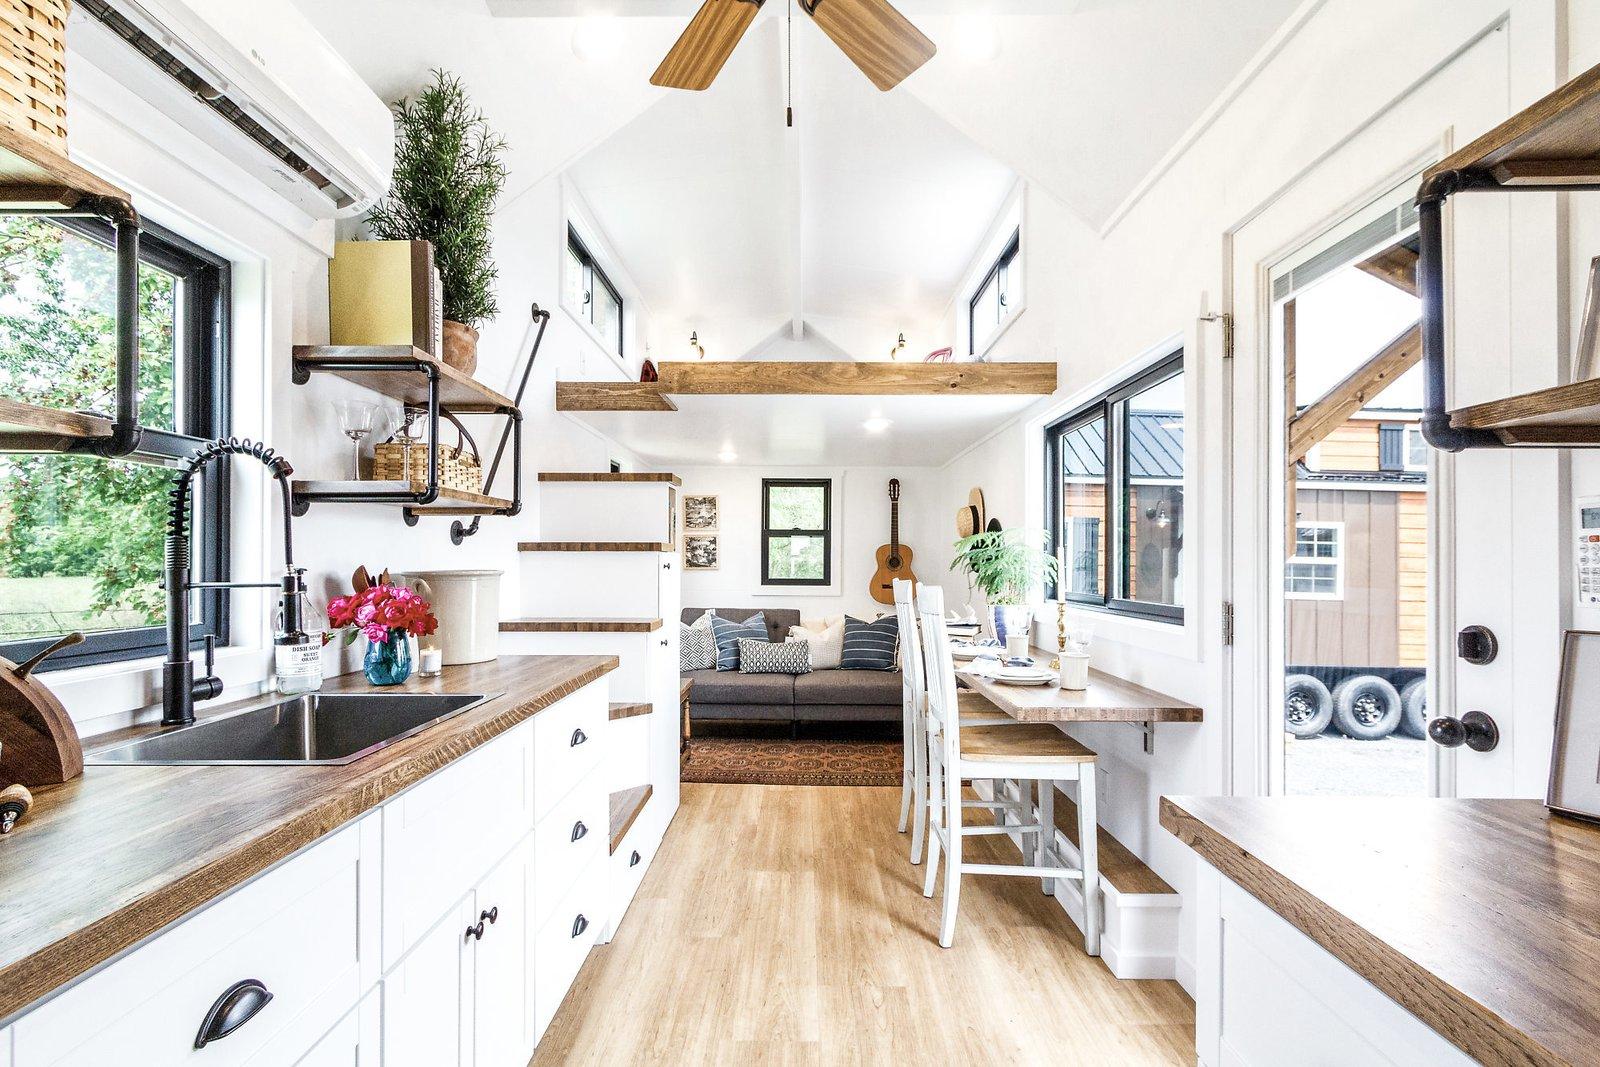 Liberation Tiny Homes Stoltzfus Rumspringa kitchen